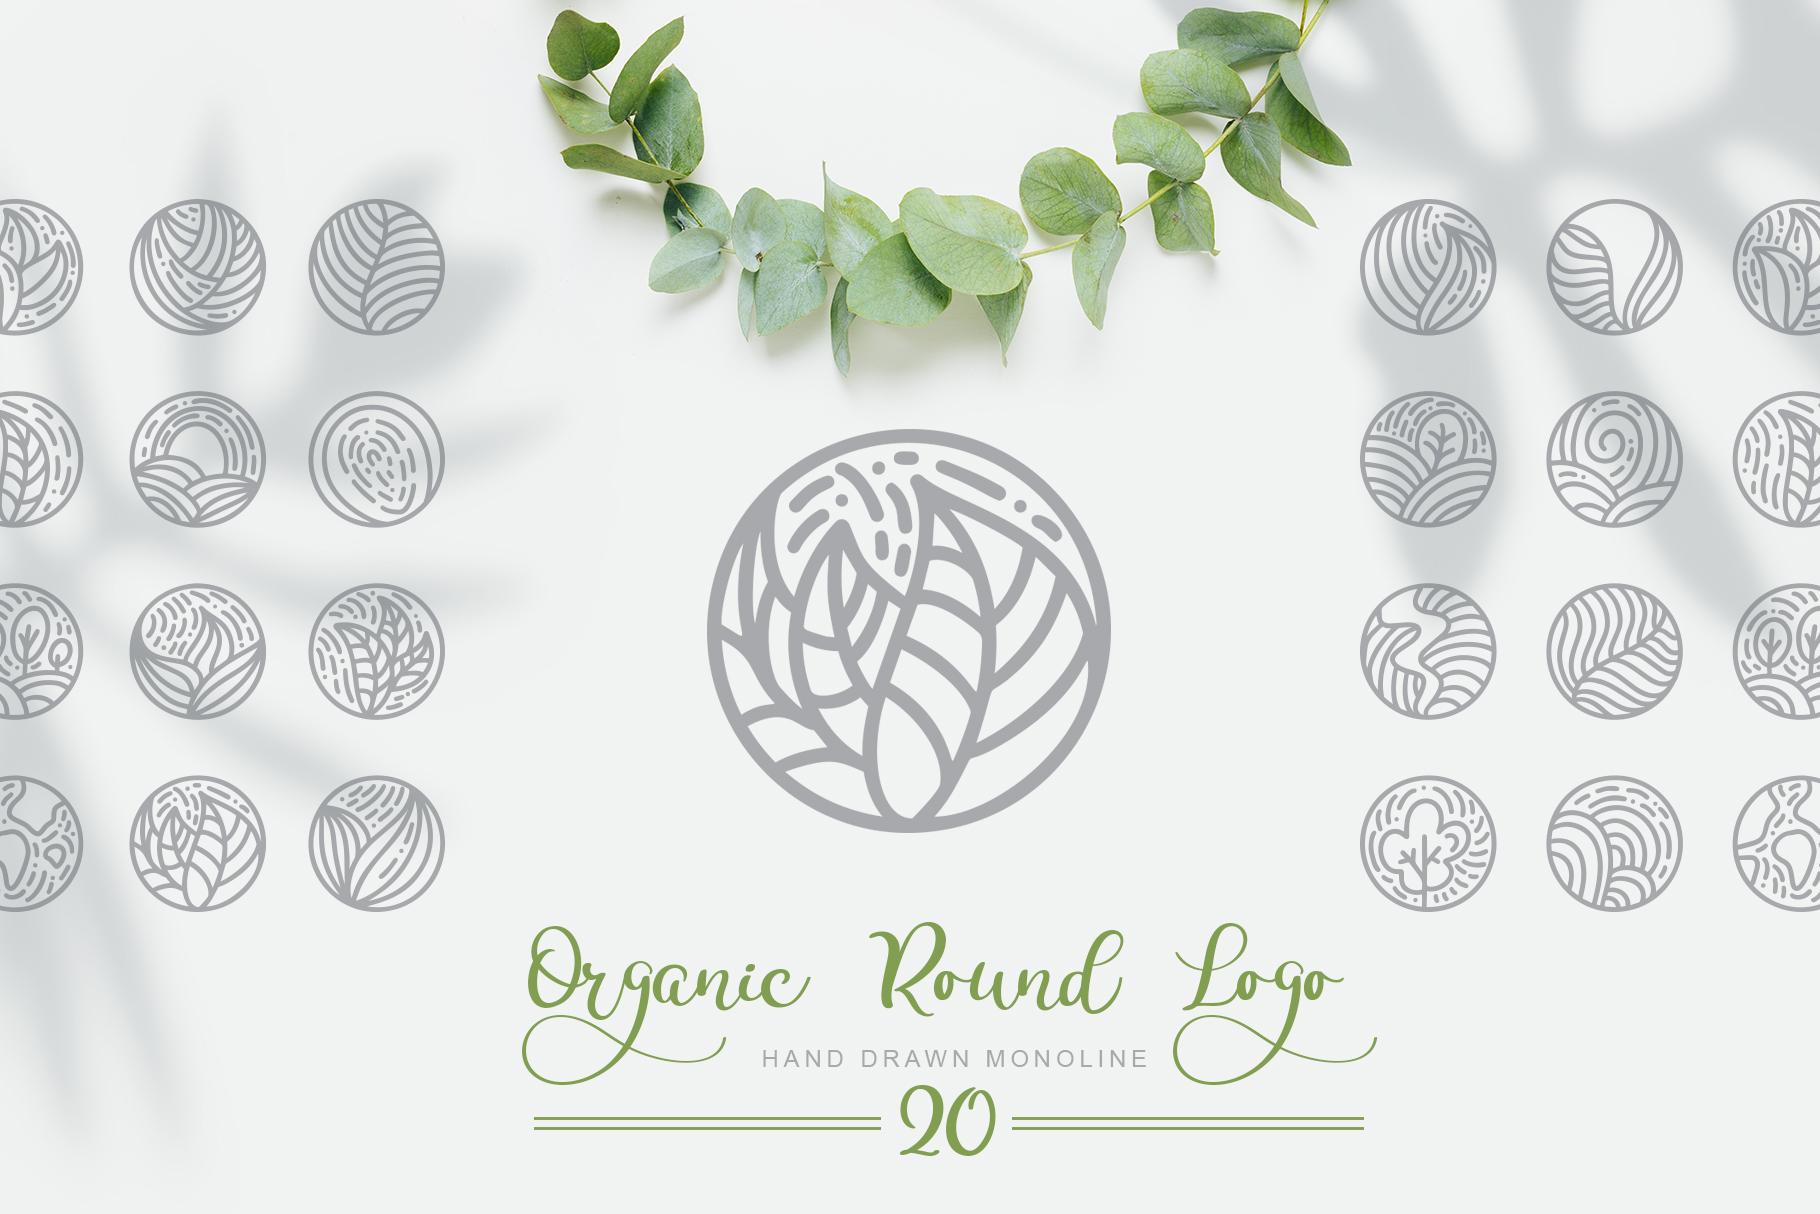 Organic Logo: Organic Round Logo Emblem - title01